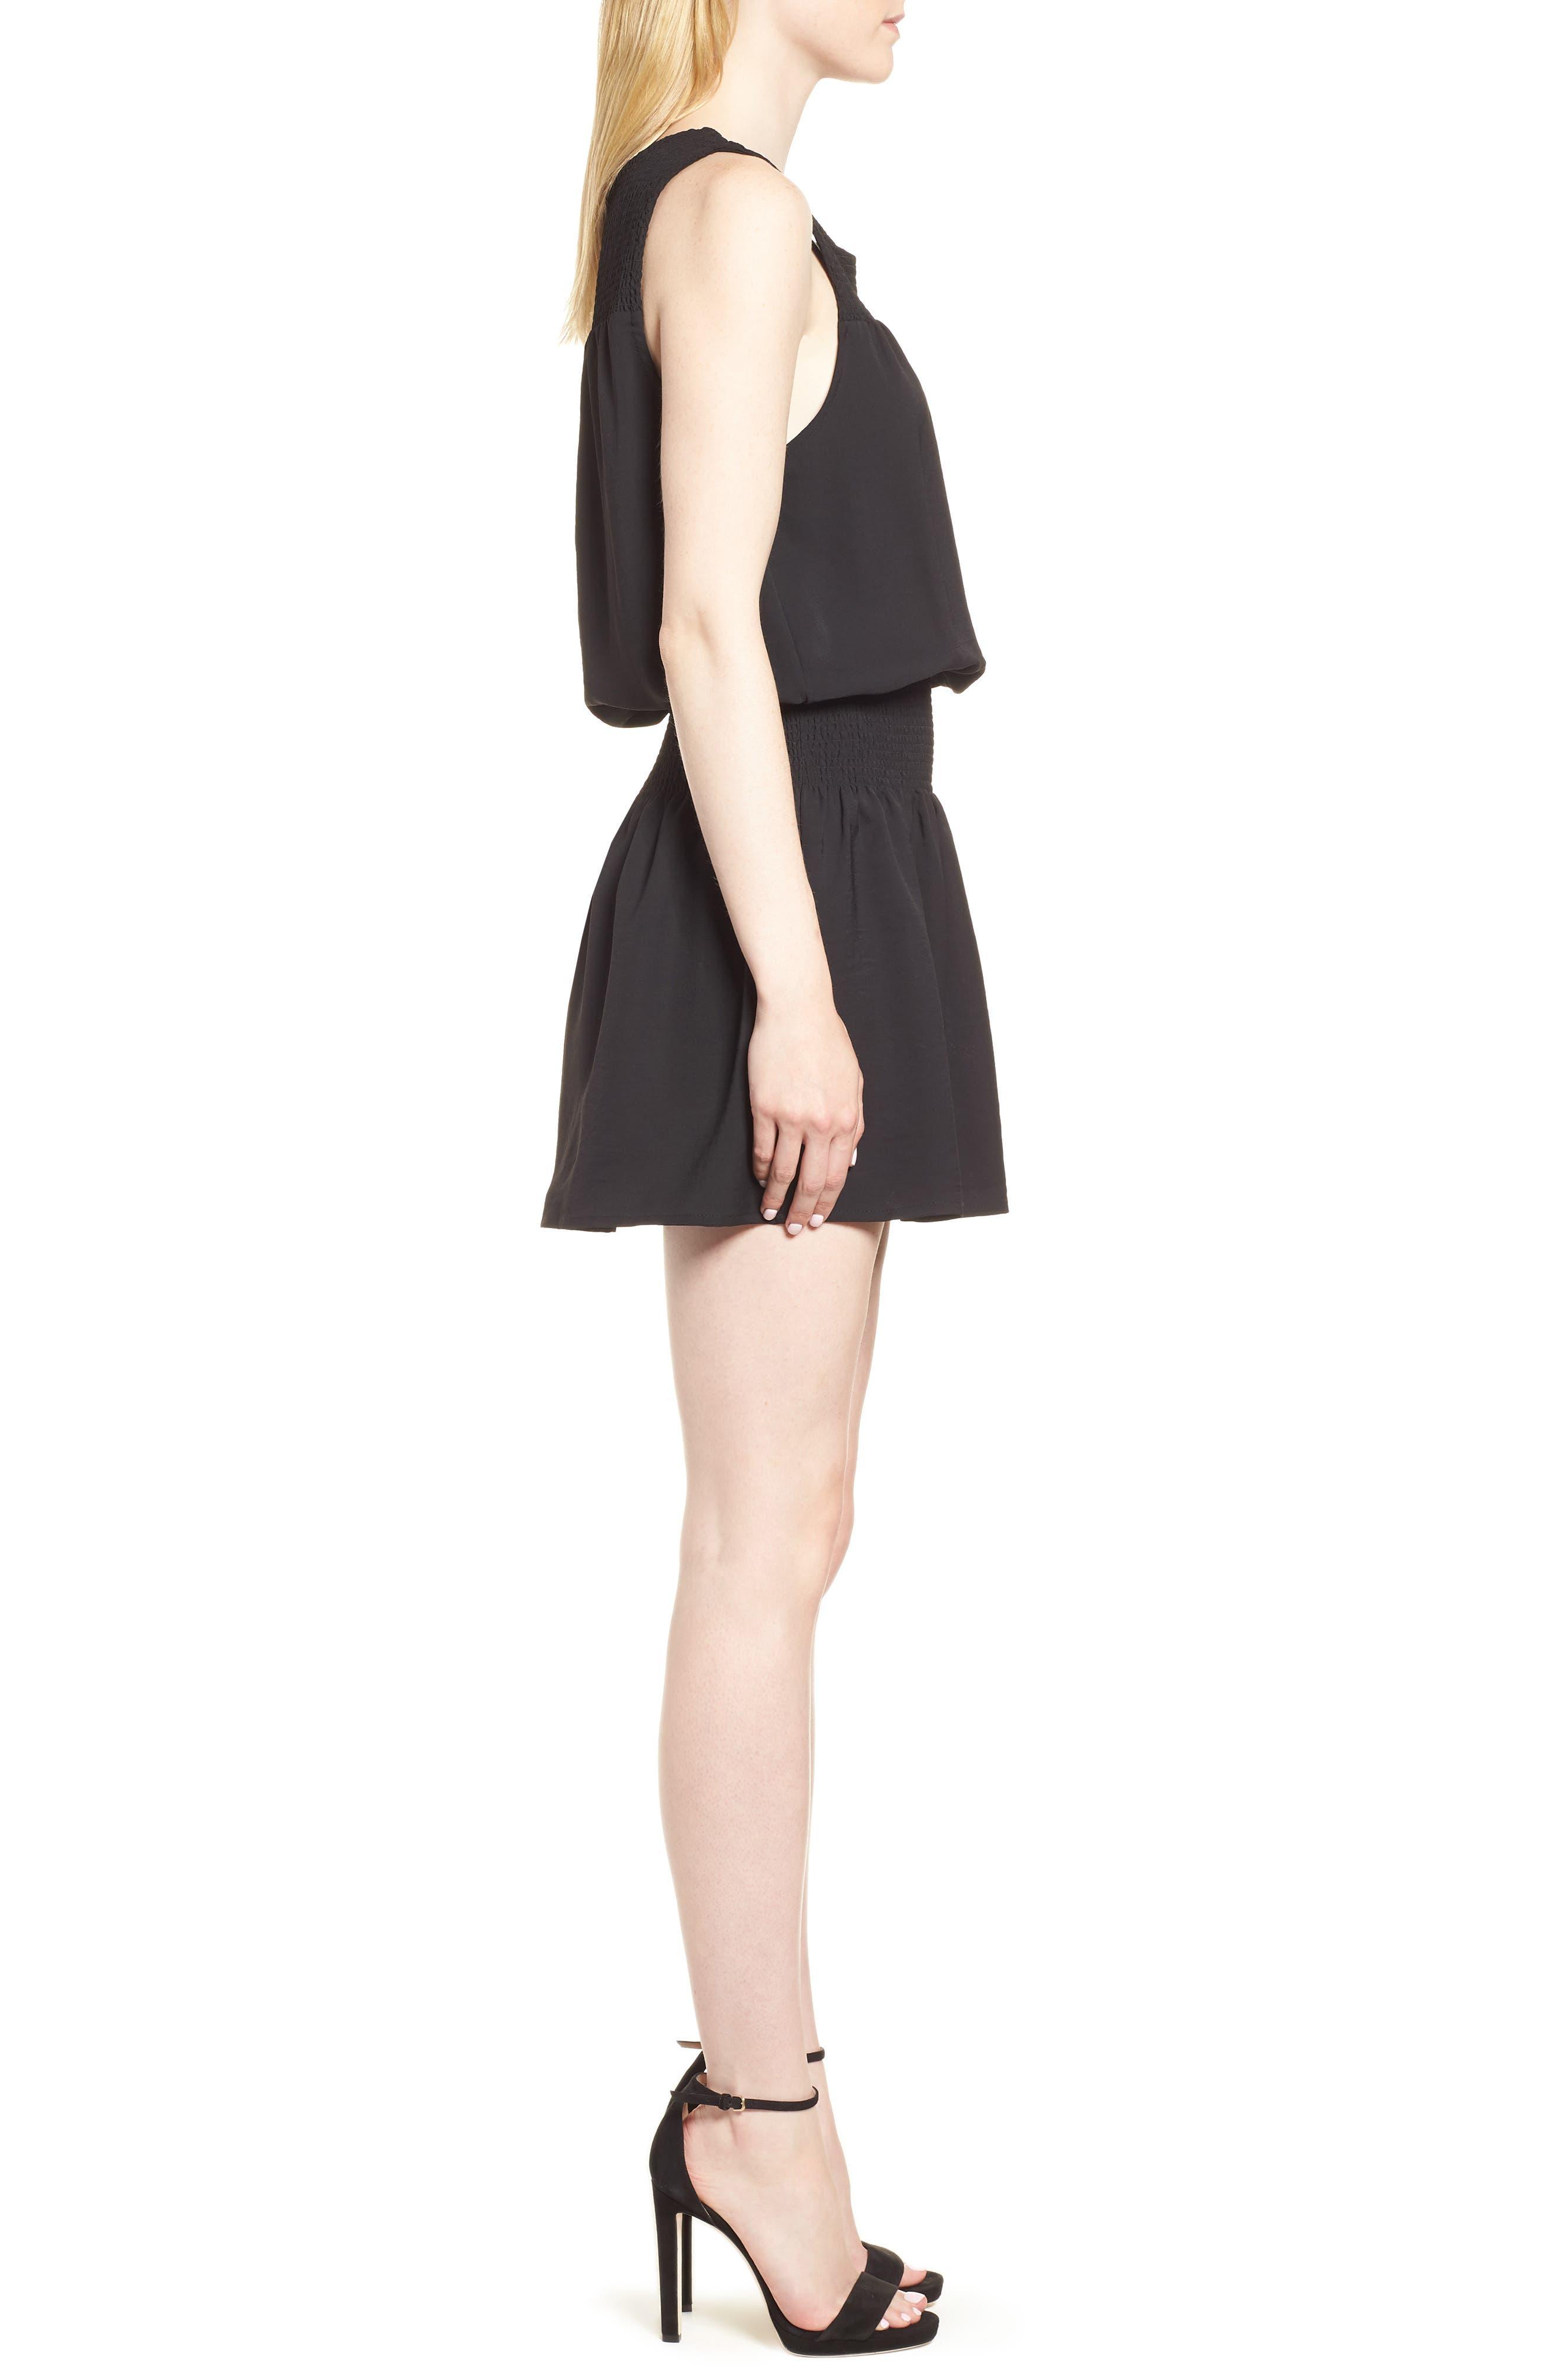 Bishop + Young Smocked Dress,                             Alternate thumbnail 3, color,                             BLACK